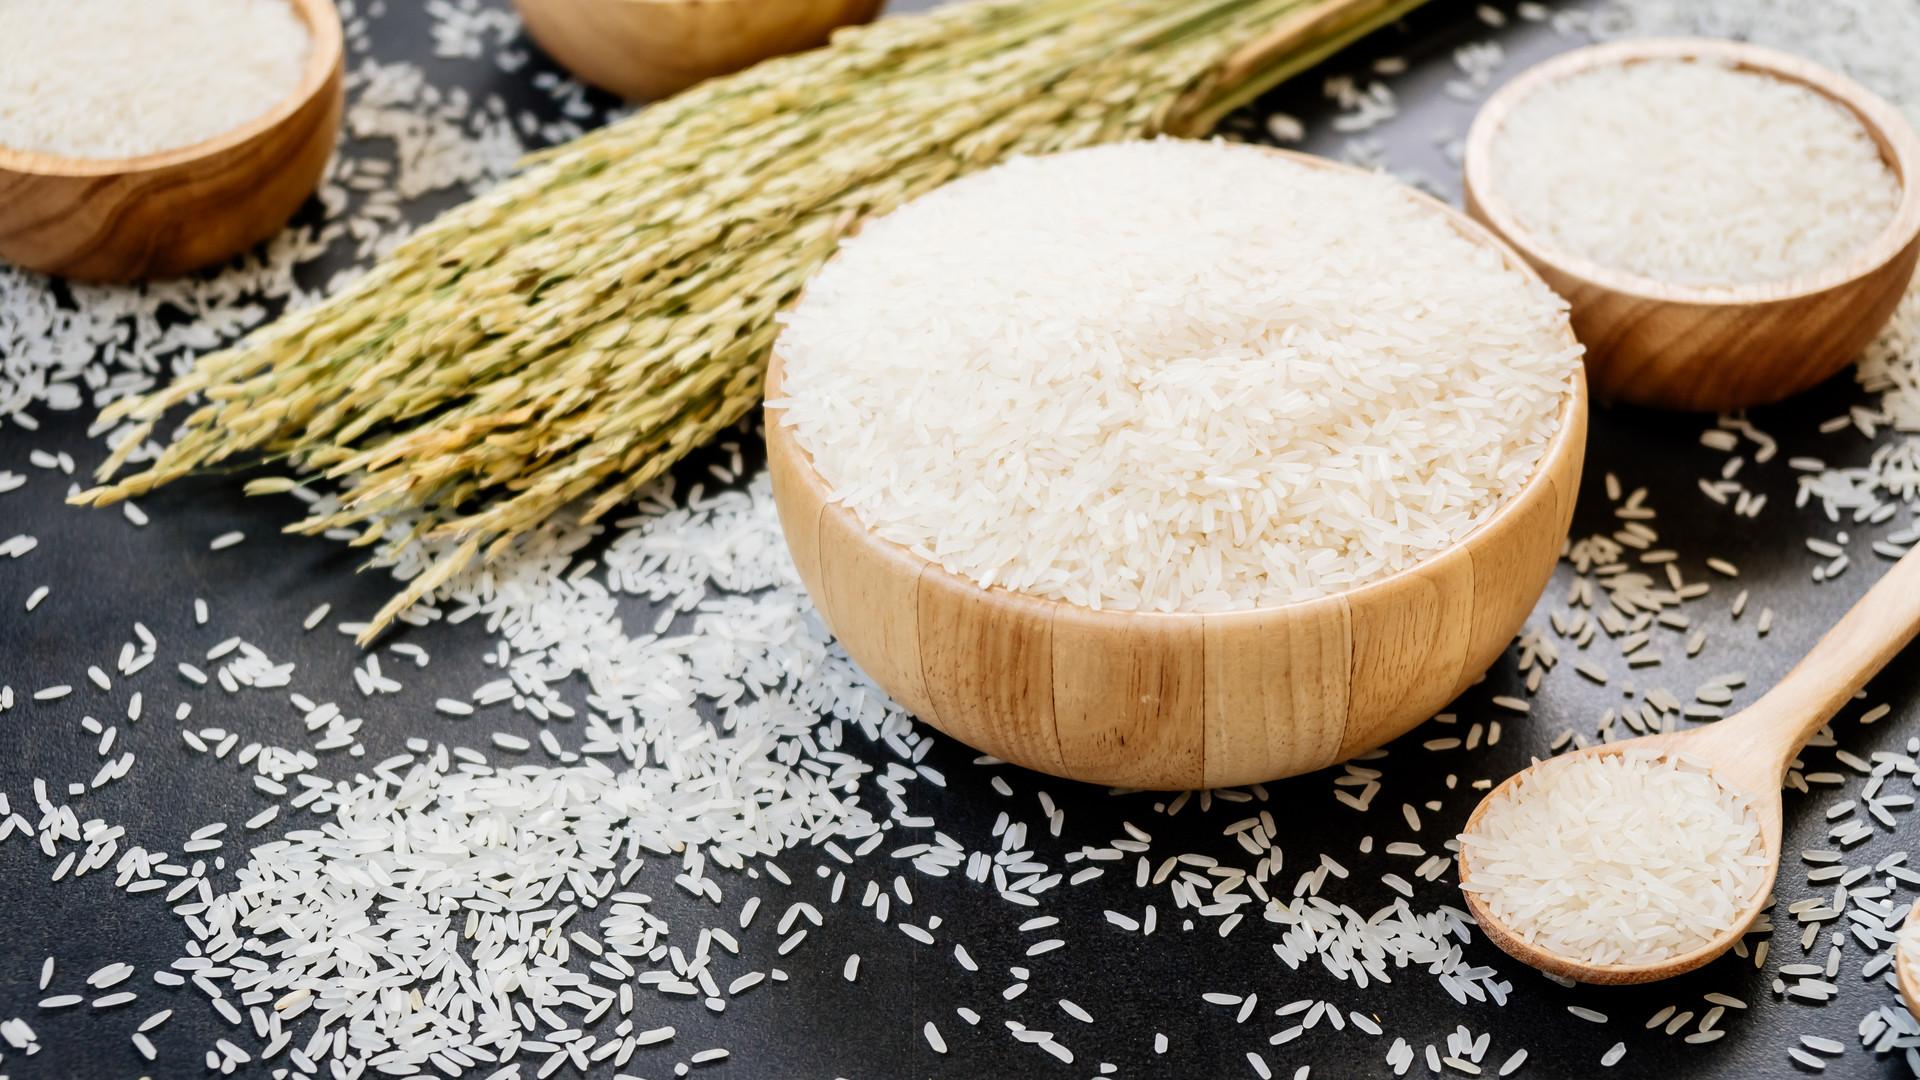 Arroz / Rice